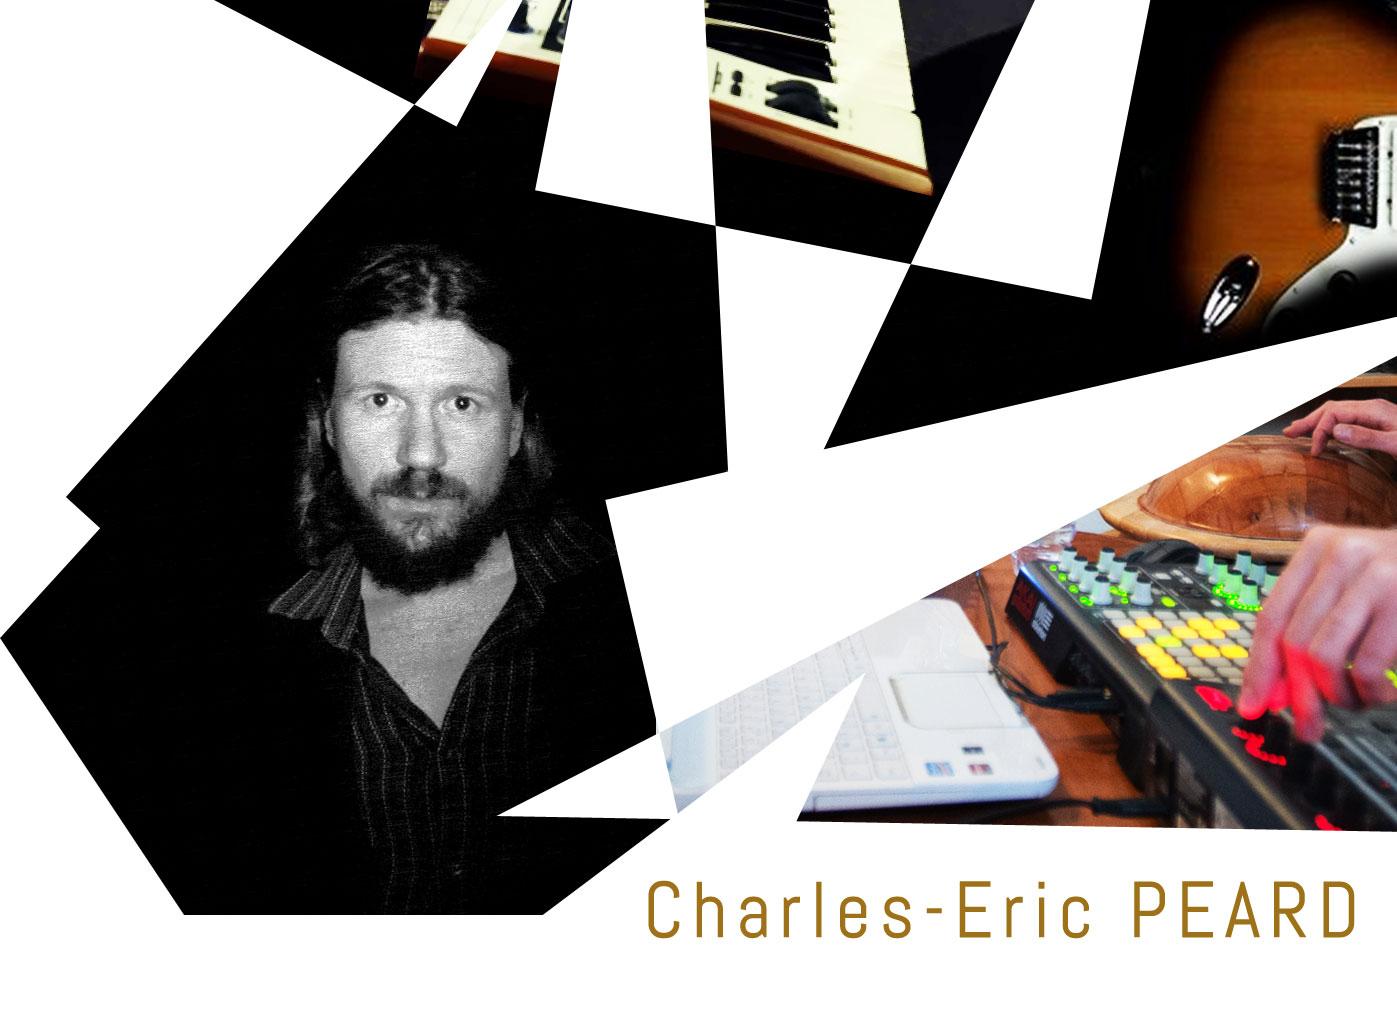 Charles-Eric PEARD, Charles-Eric Péard, cepSound |design|